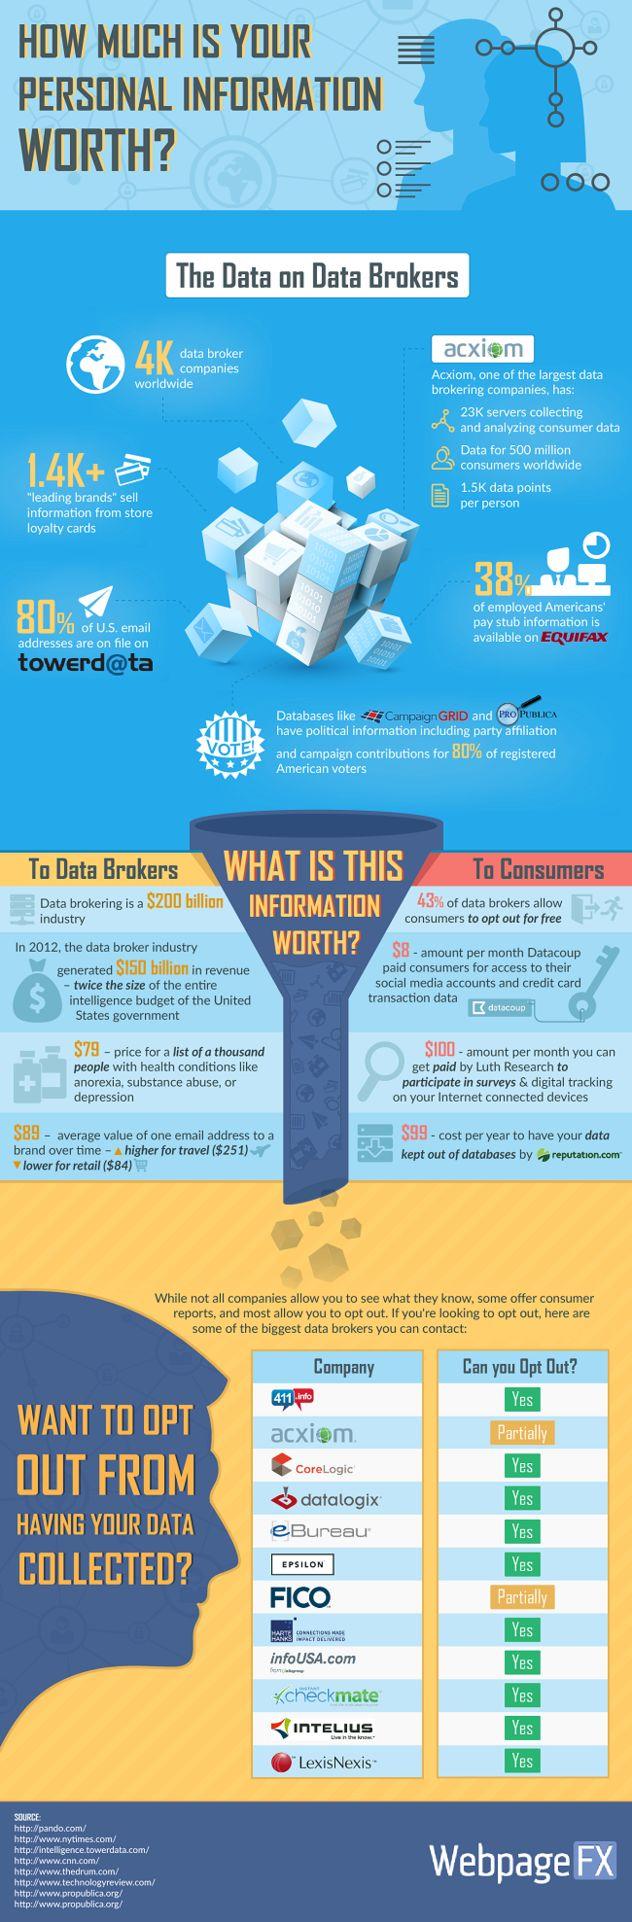 Dark Patterns and Data Brokering